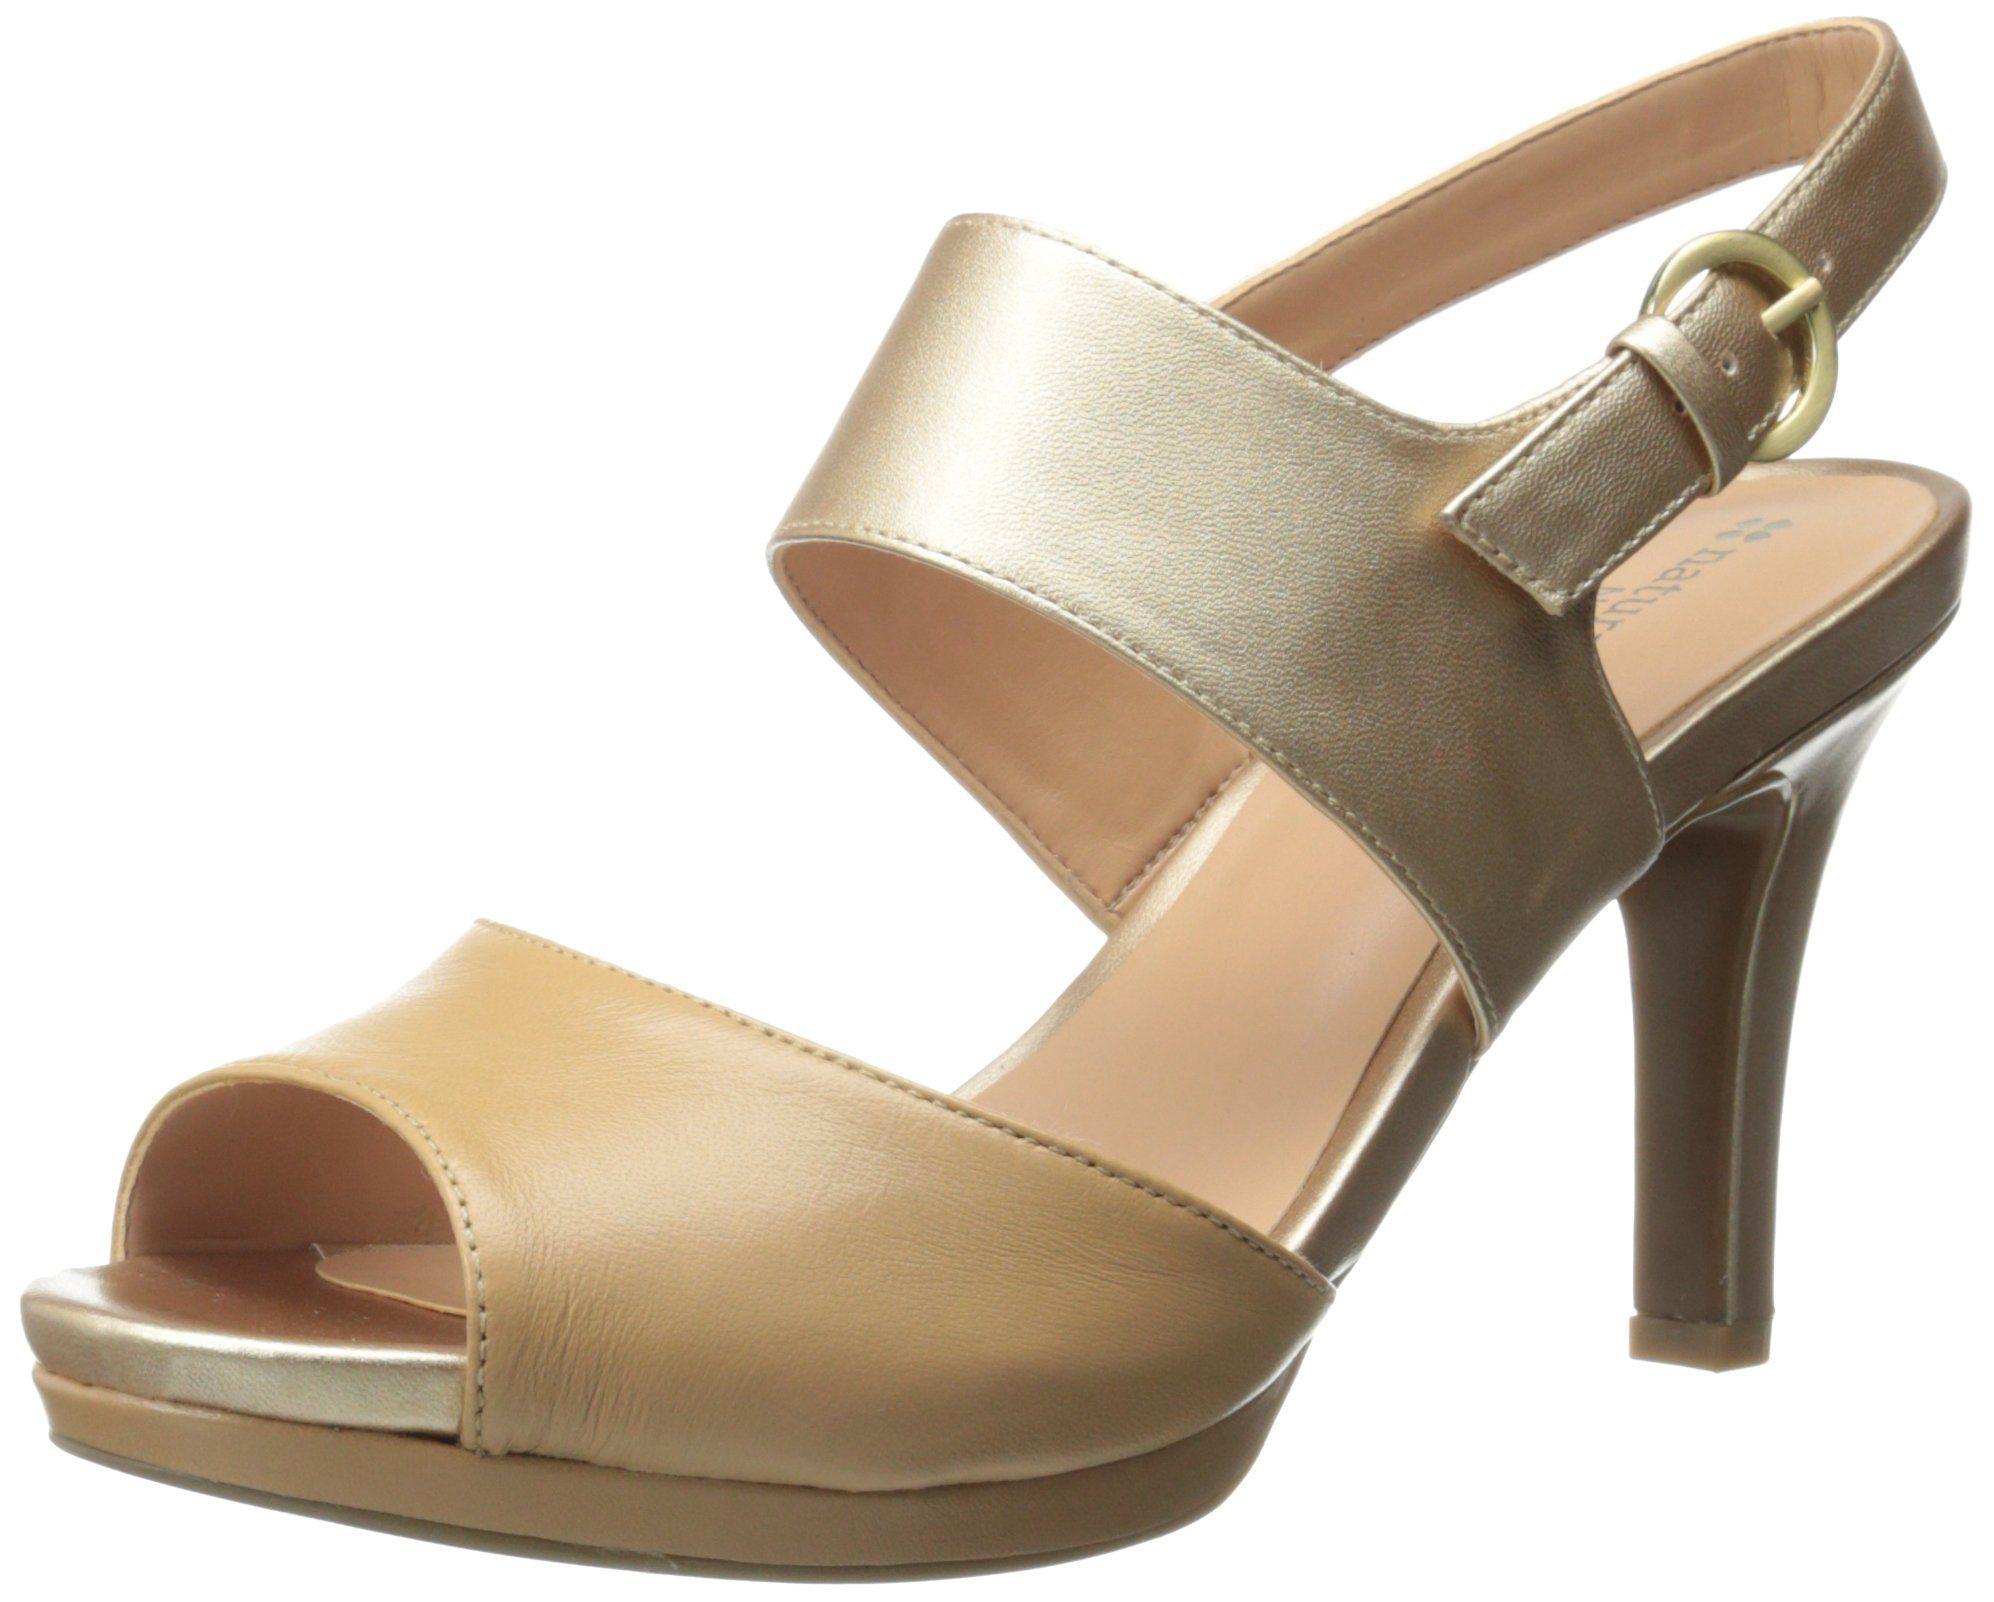 233ae88879146 Amazon.com: Naturalizer Women's Nebula Dress Sandal: Shoes | Sandals ...